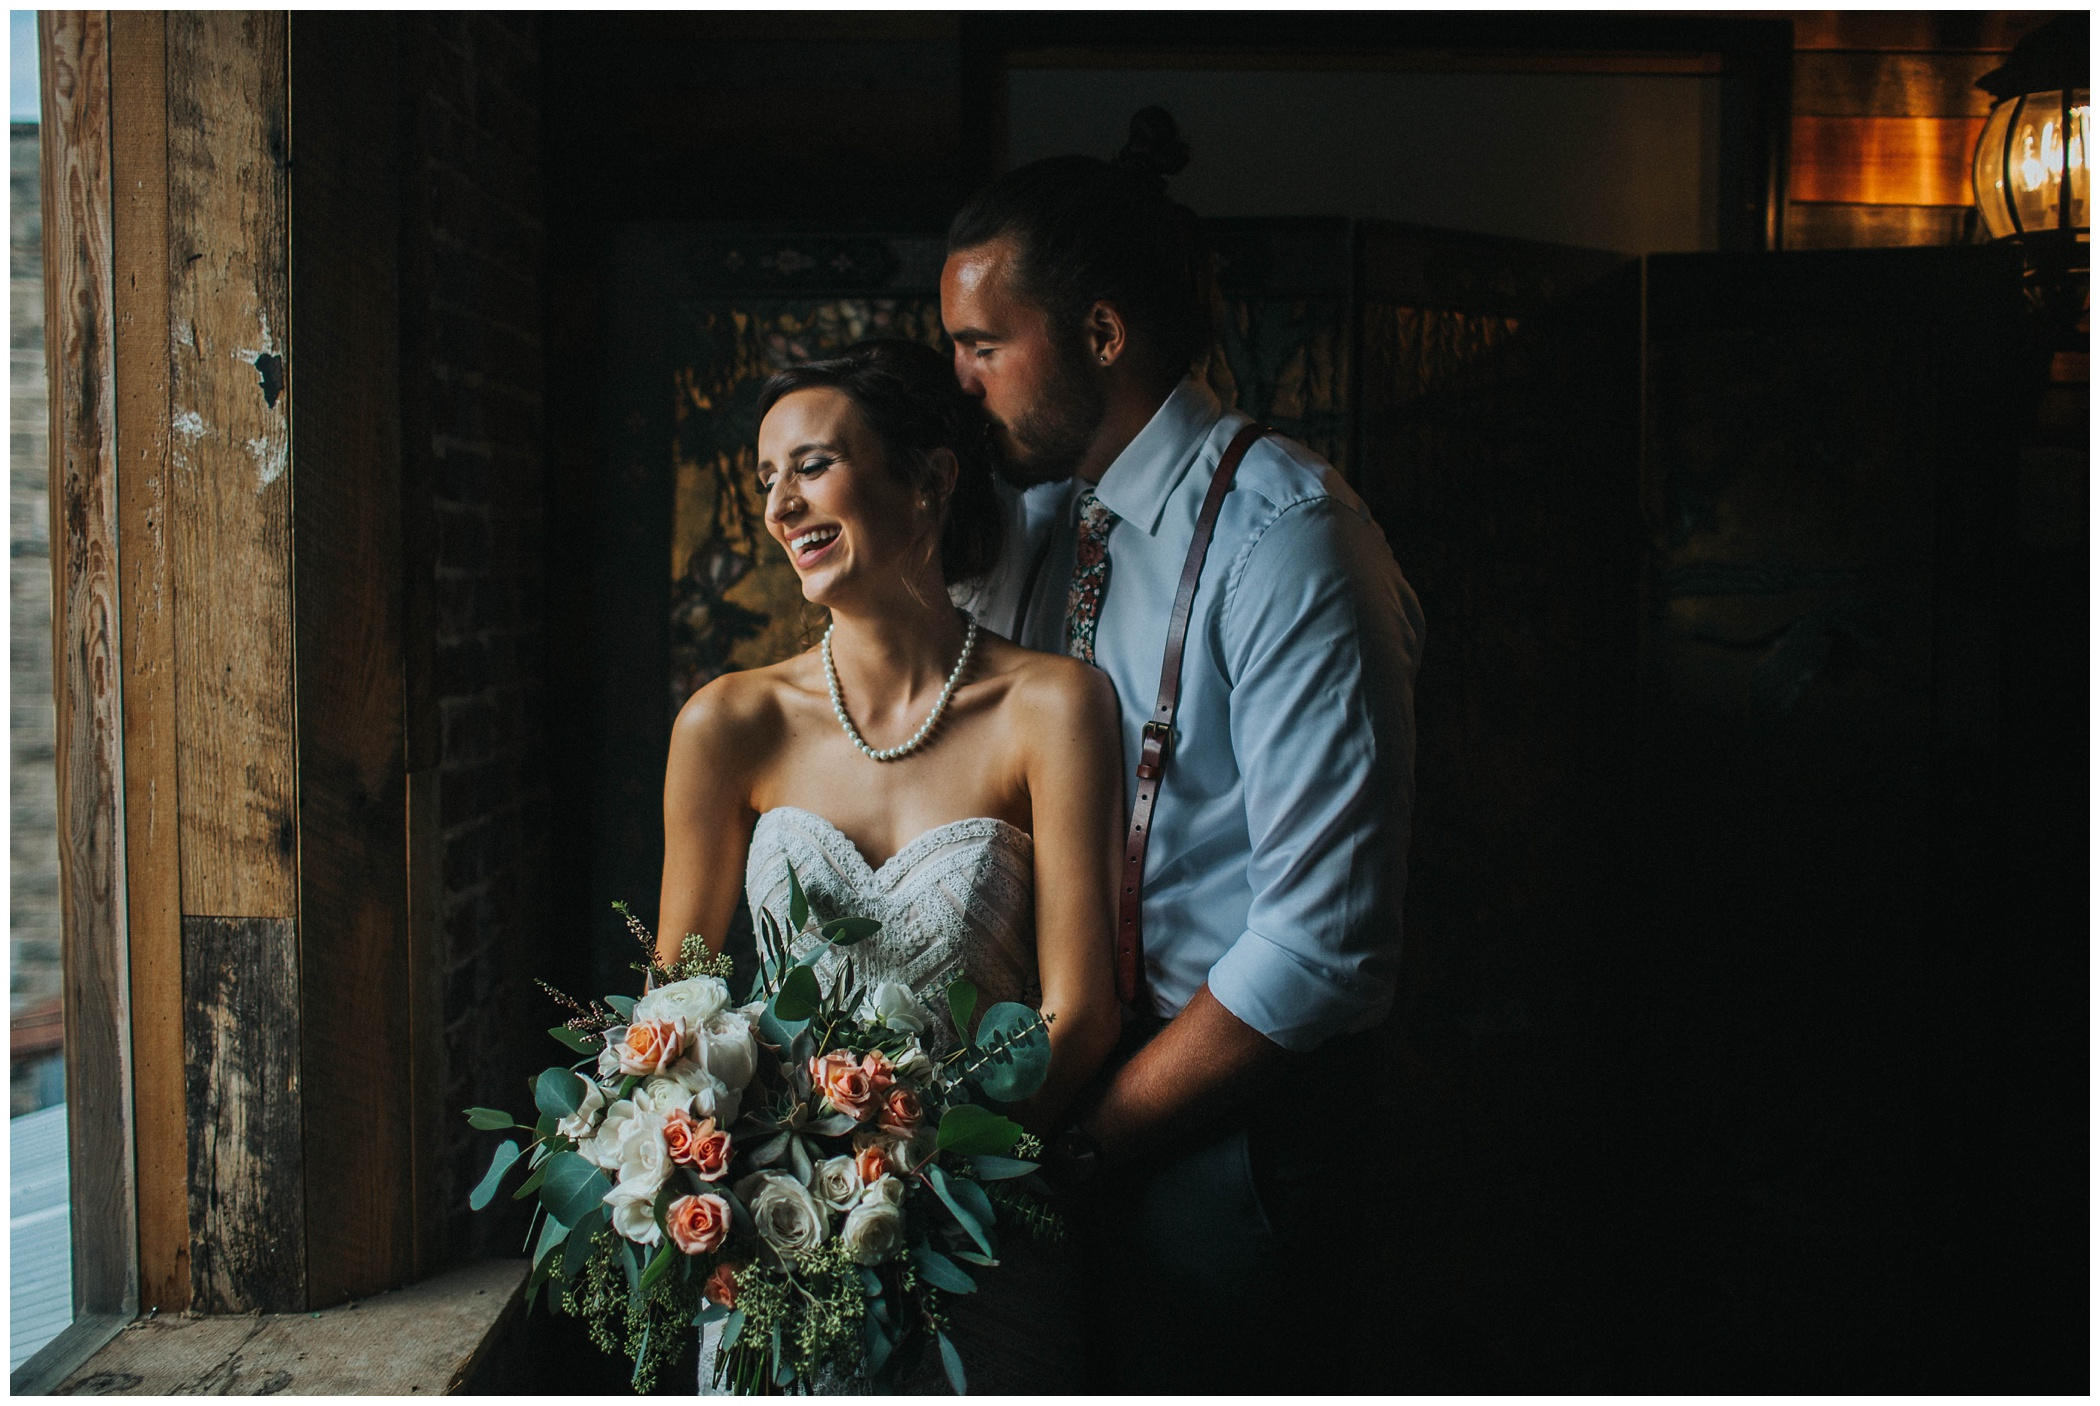 ravington, bridal, photos, the, ravington, centerson, northwest, arkansas, johnsons, photo, wedding, photography